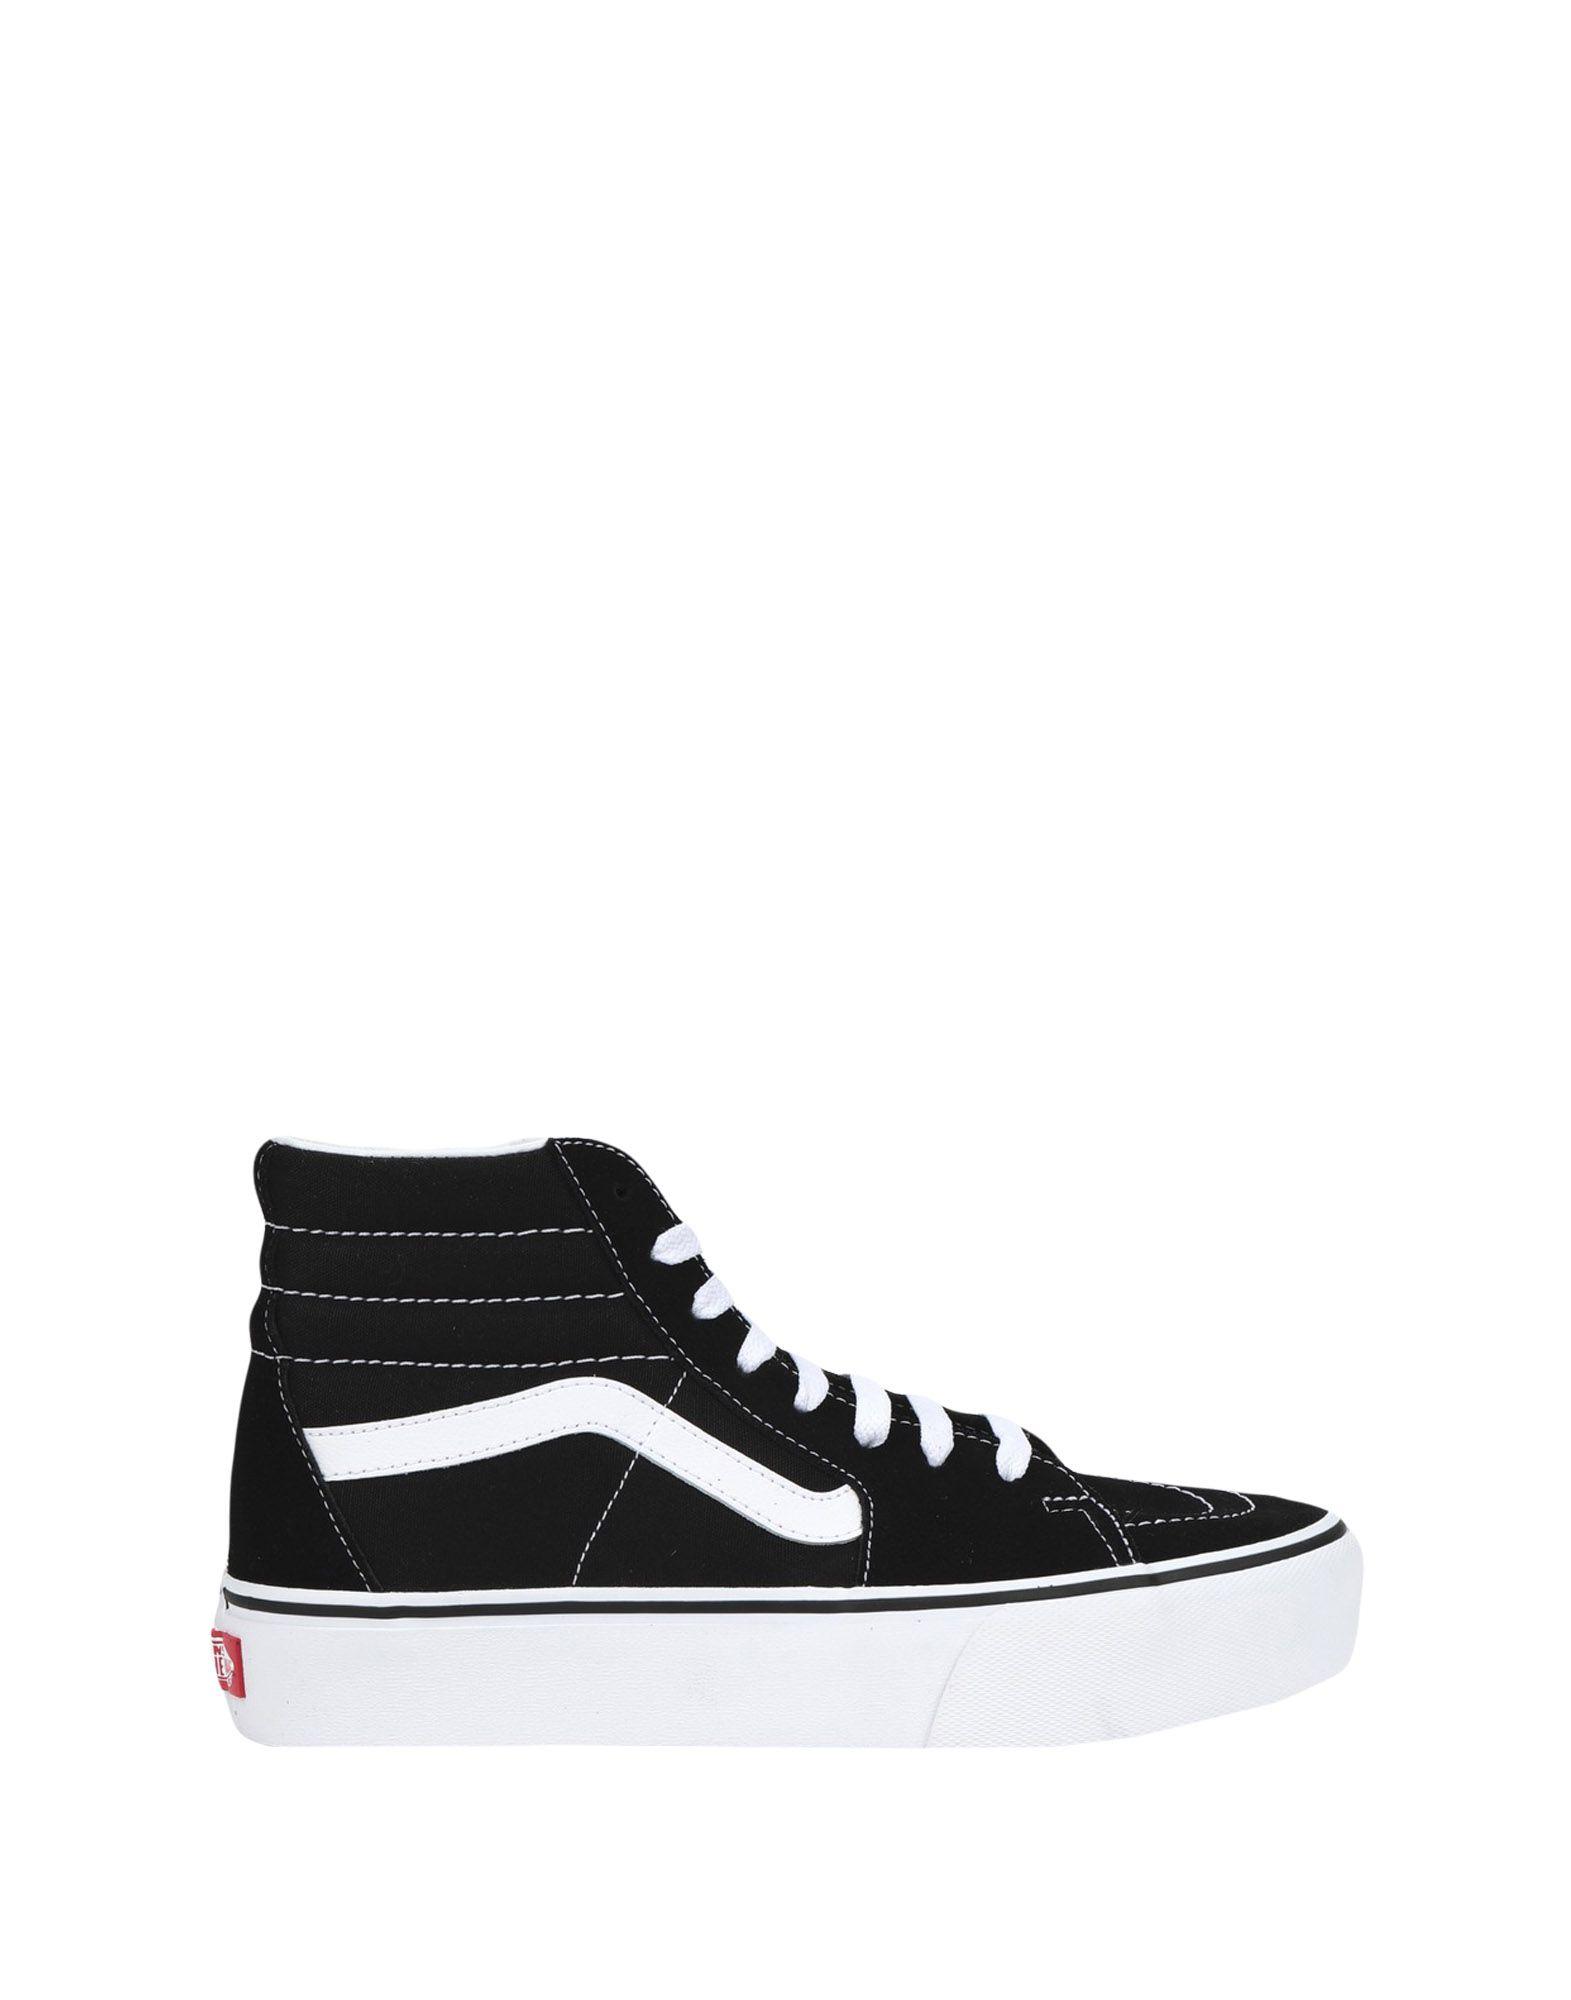 Vans Ua Sk8-Hi Platform 5 - Sneakers - Women Vans Canada Sneakers online on  Canada Vans - 11571679MM b75beb